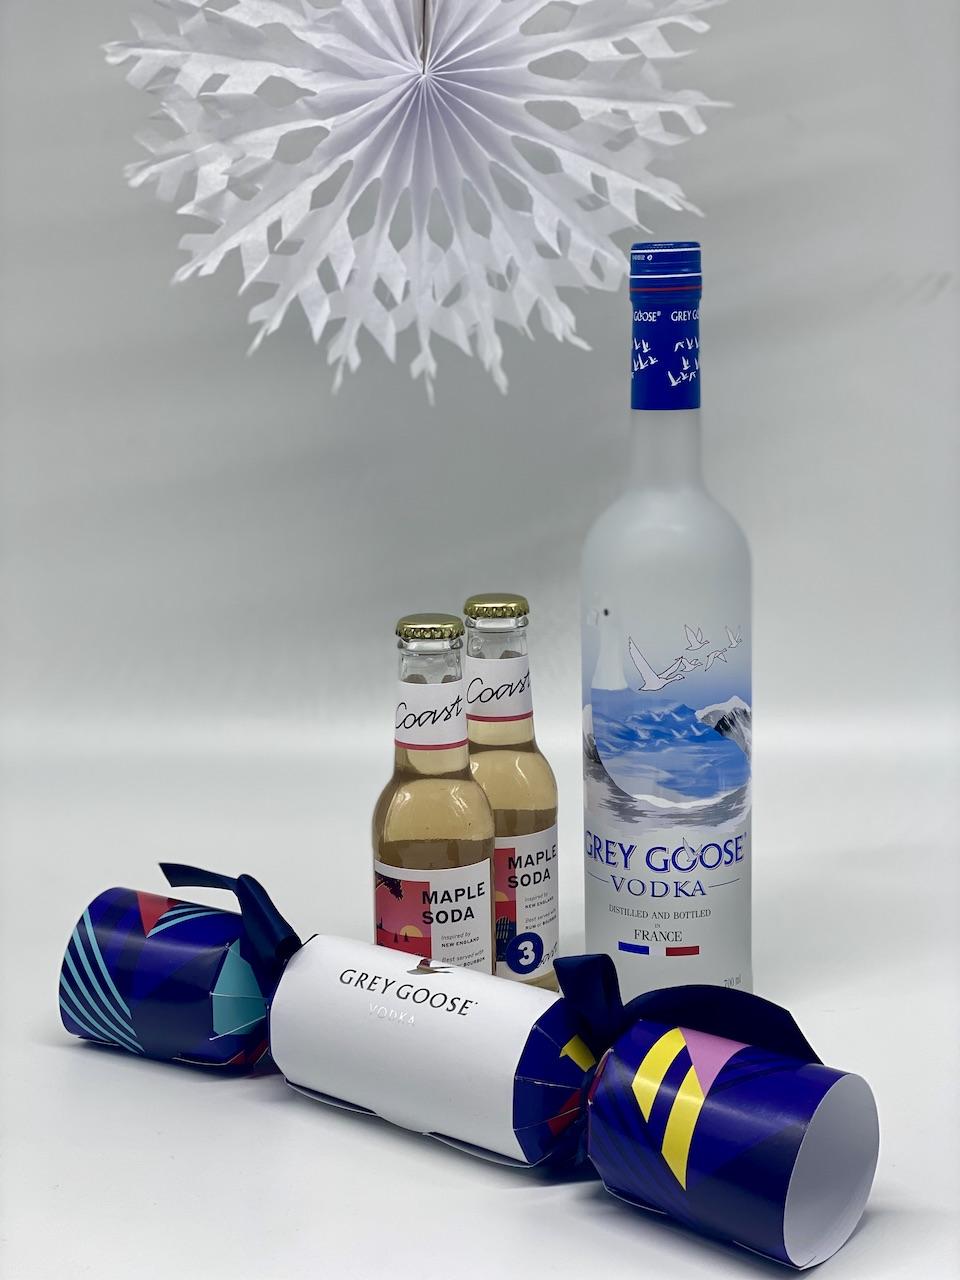 Grey Goose vodka and Giz 'n' Green